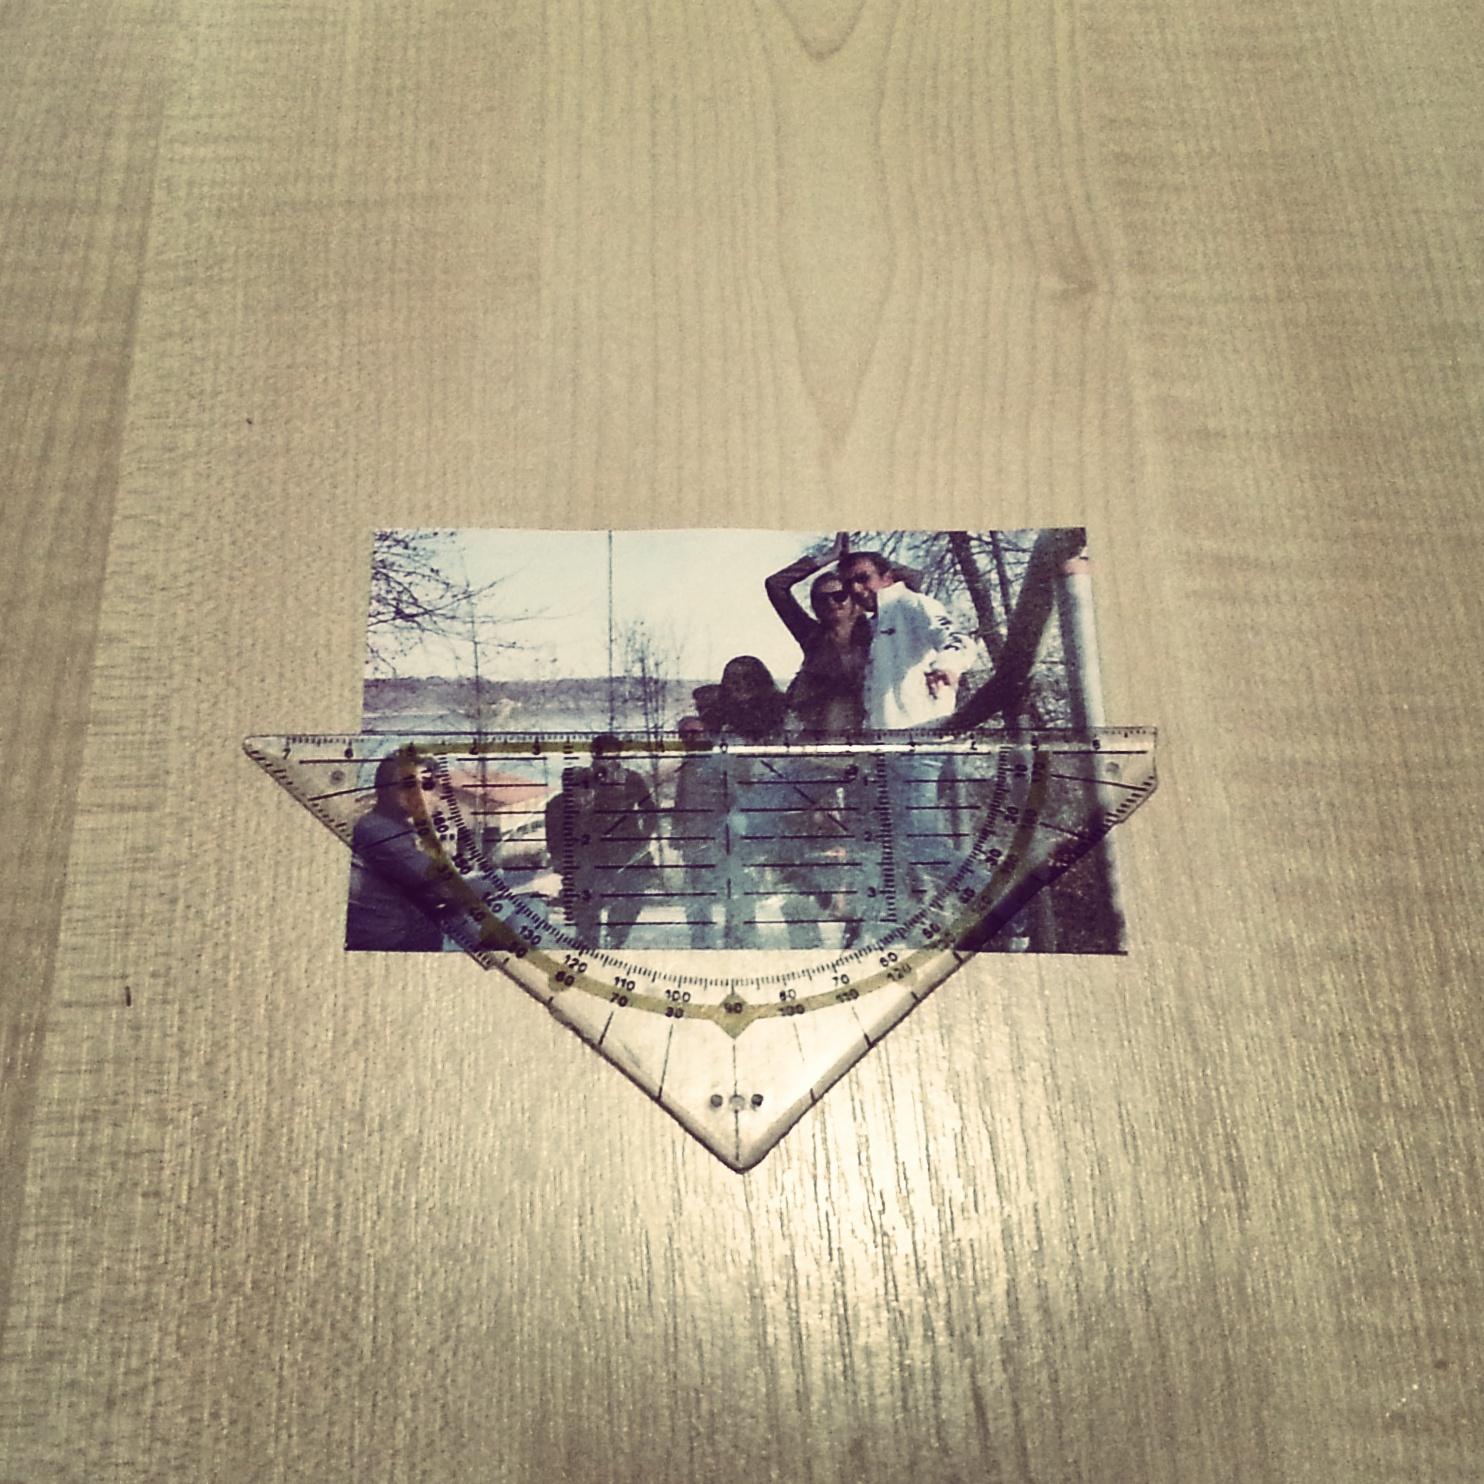 Schön DIY Würfelpuzzle basteln • Kreativ Blog - DIY & Gadgets YH59